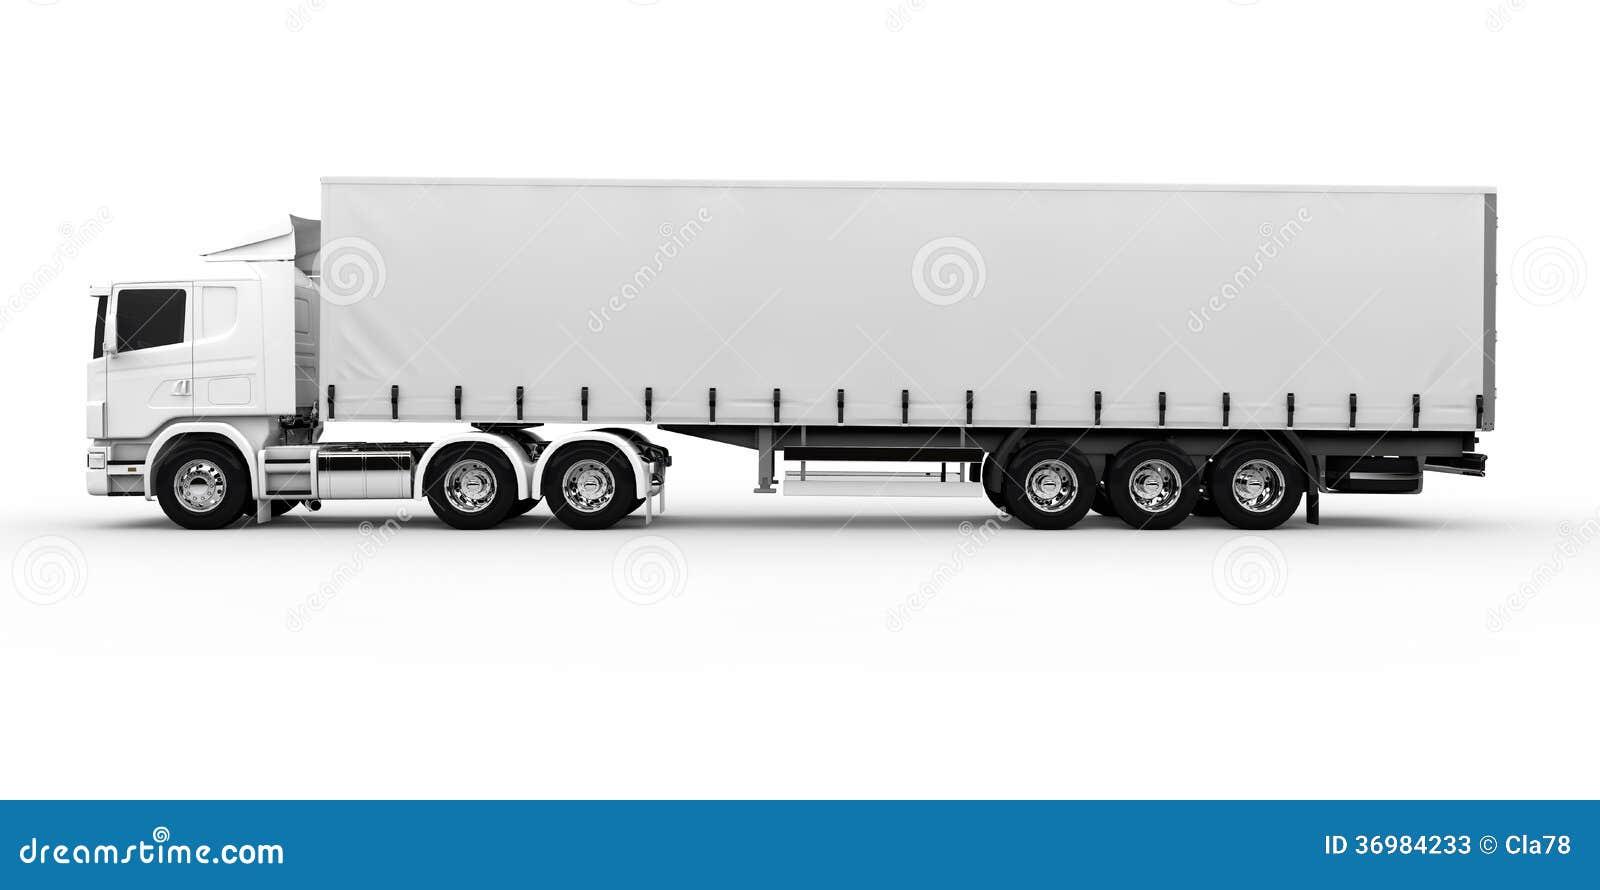 white truck stock photos image 36984233 Front View Semi Truck Clip Art Semi Truck Logos